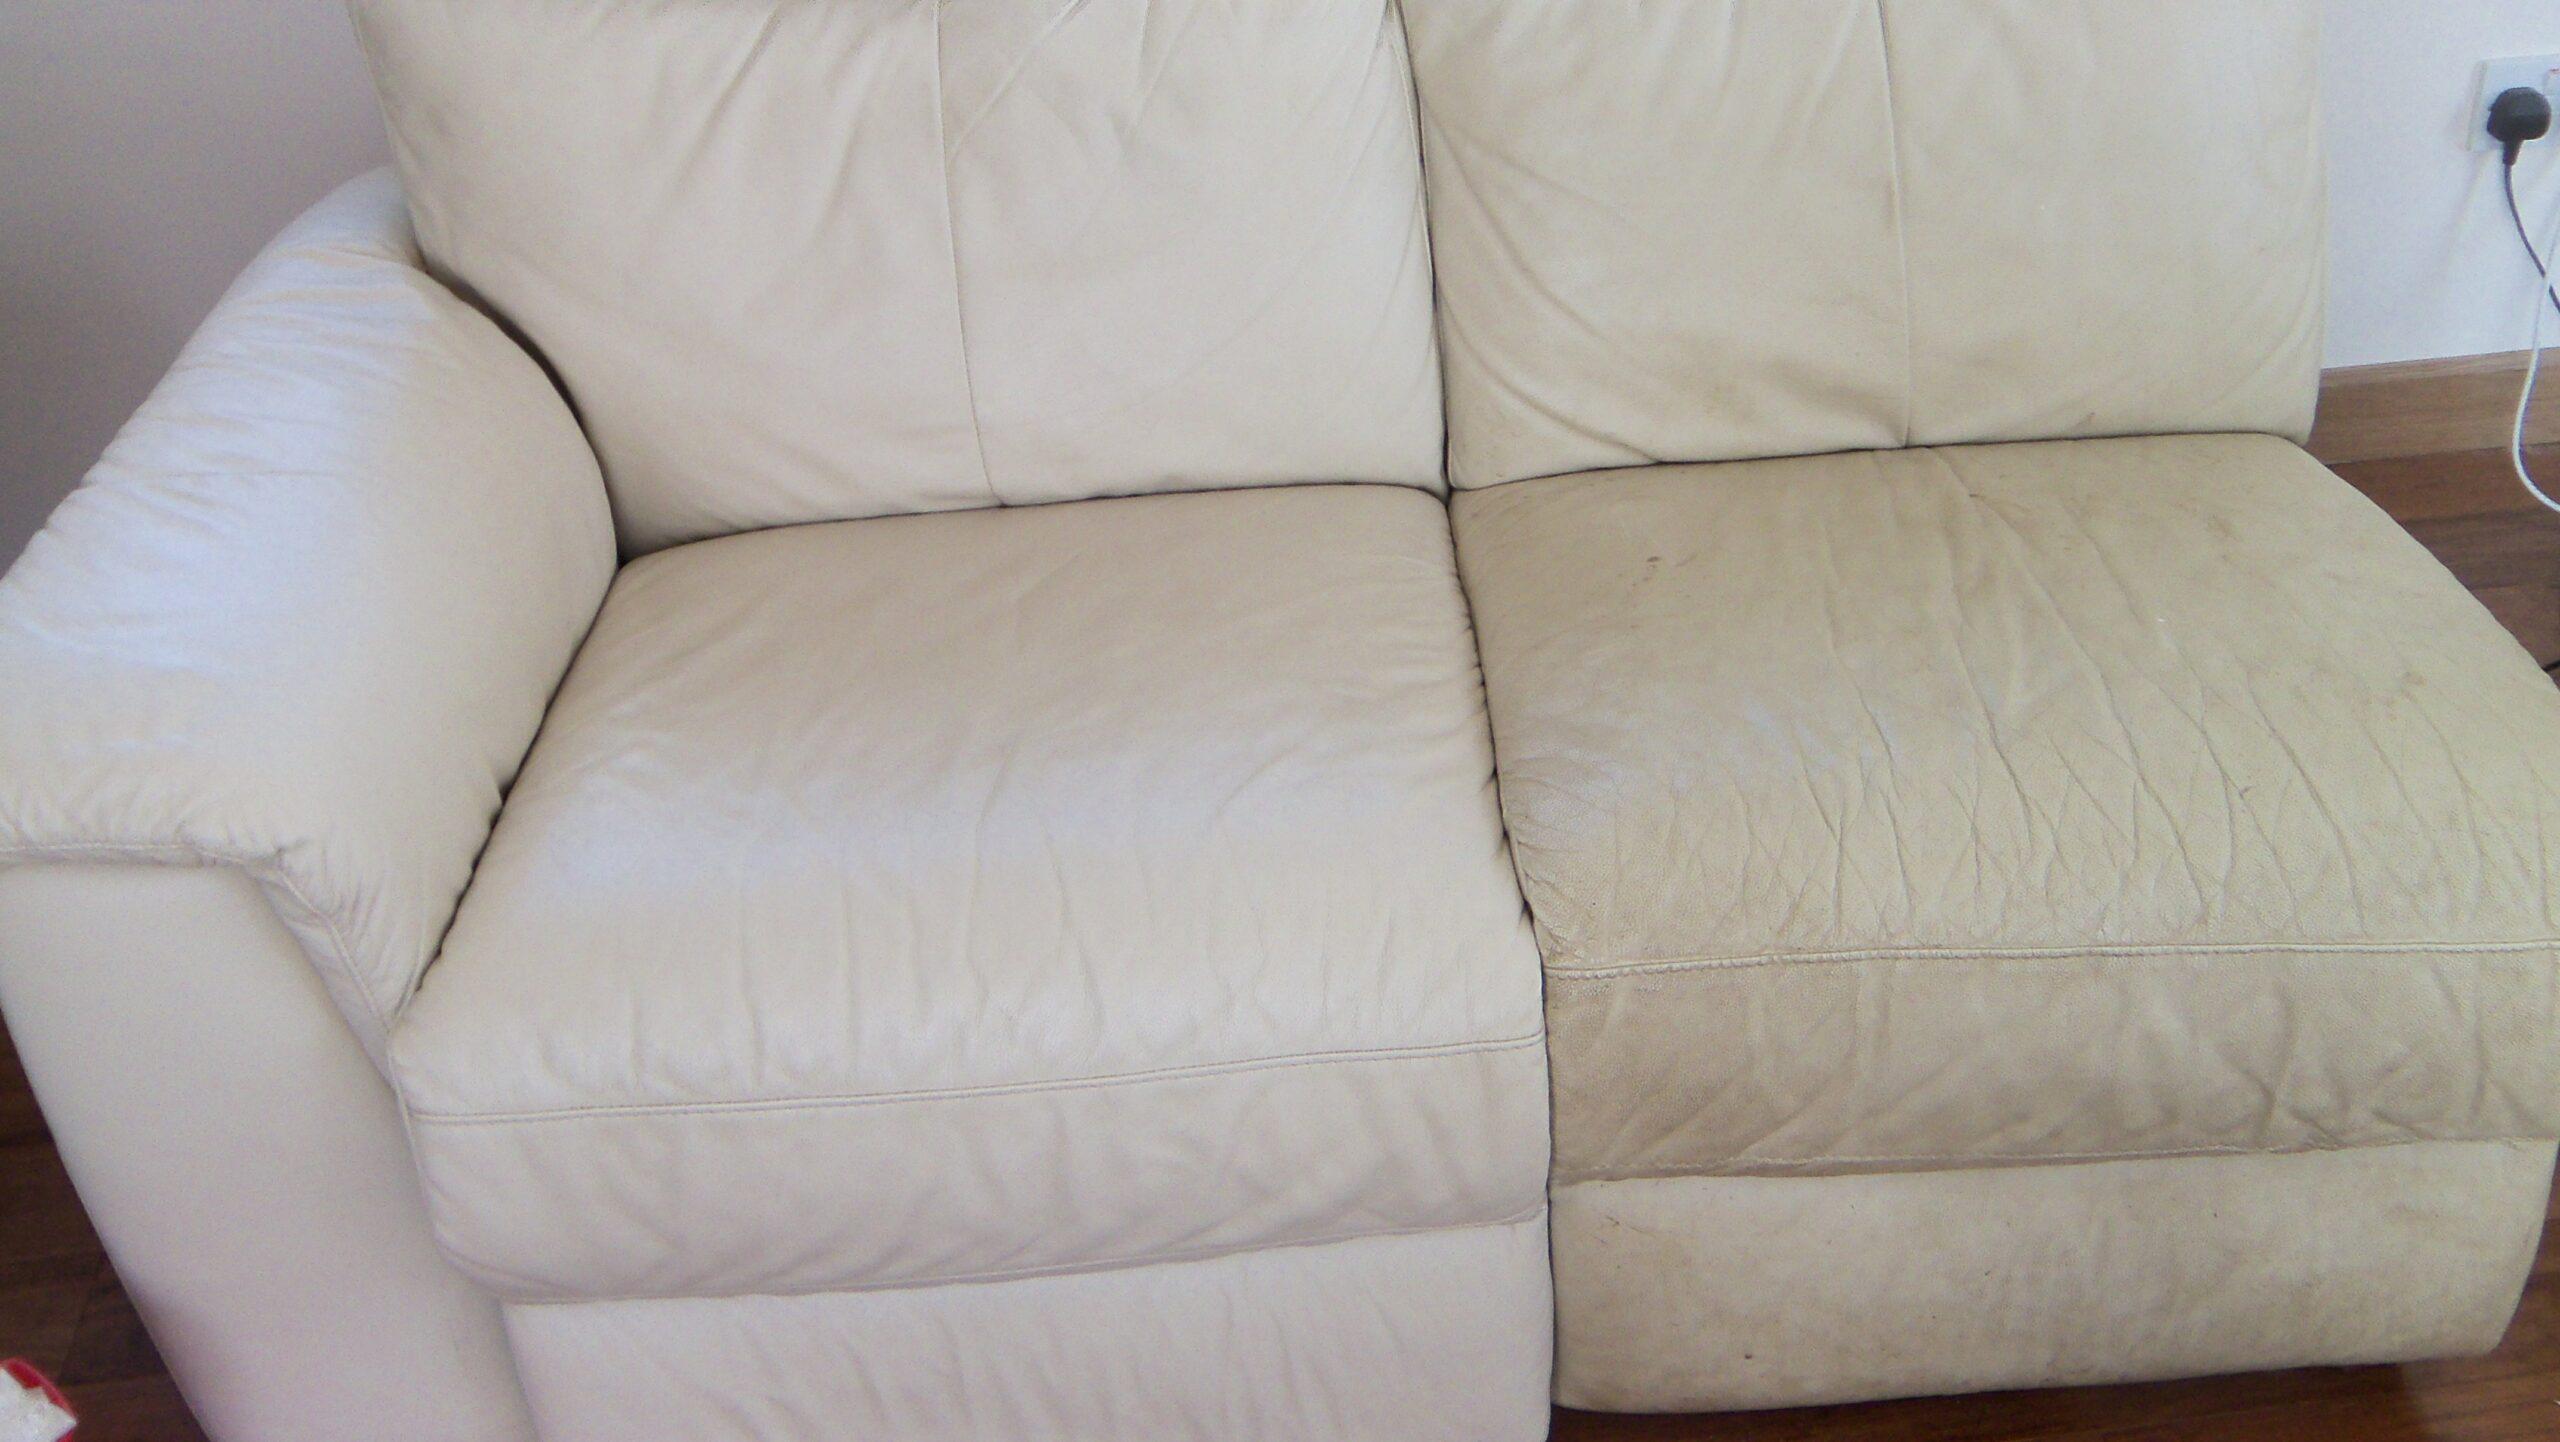 leather sofa cleaning London - Supreme Furnishings